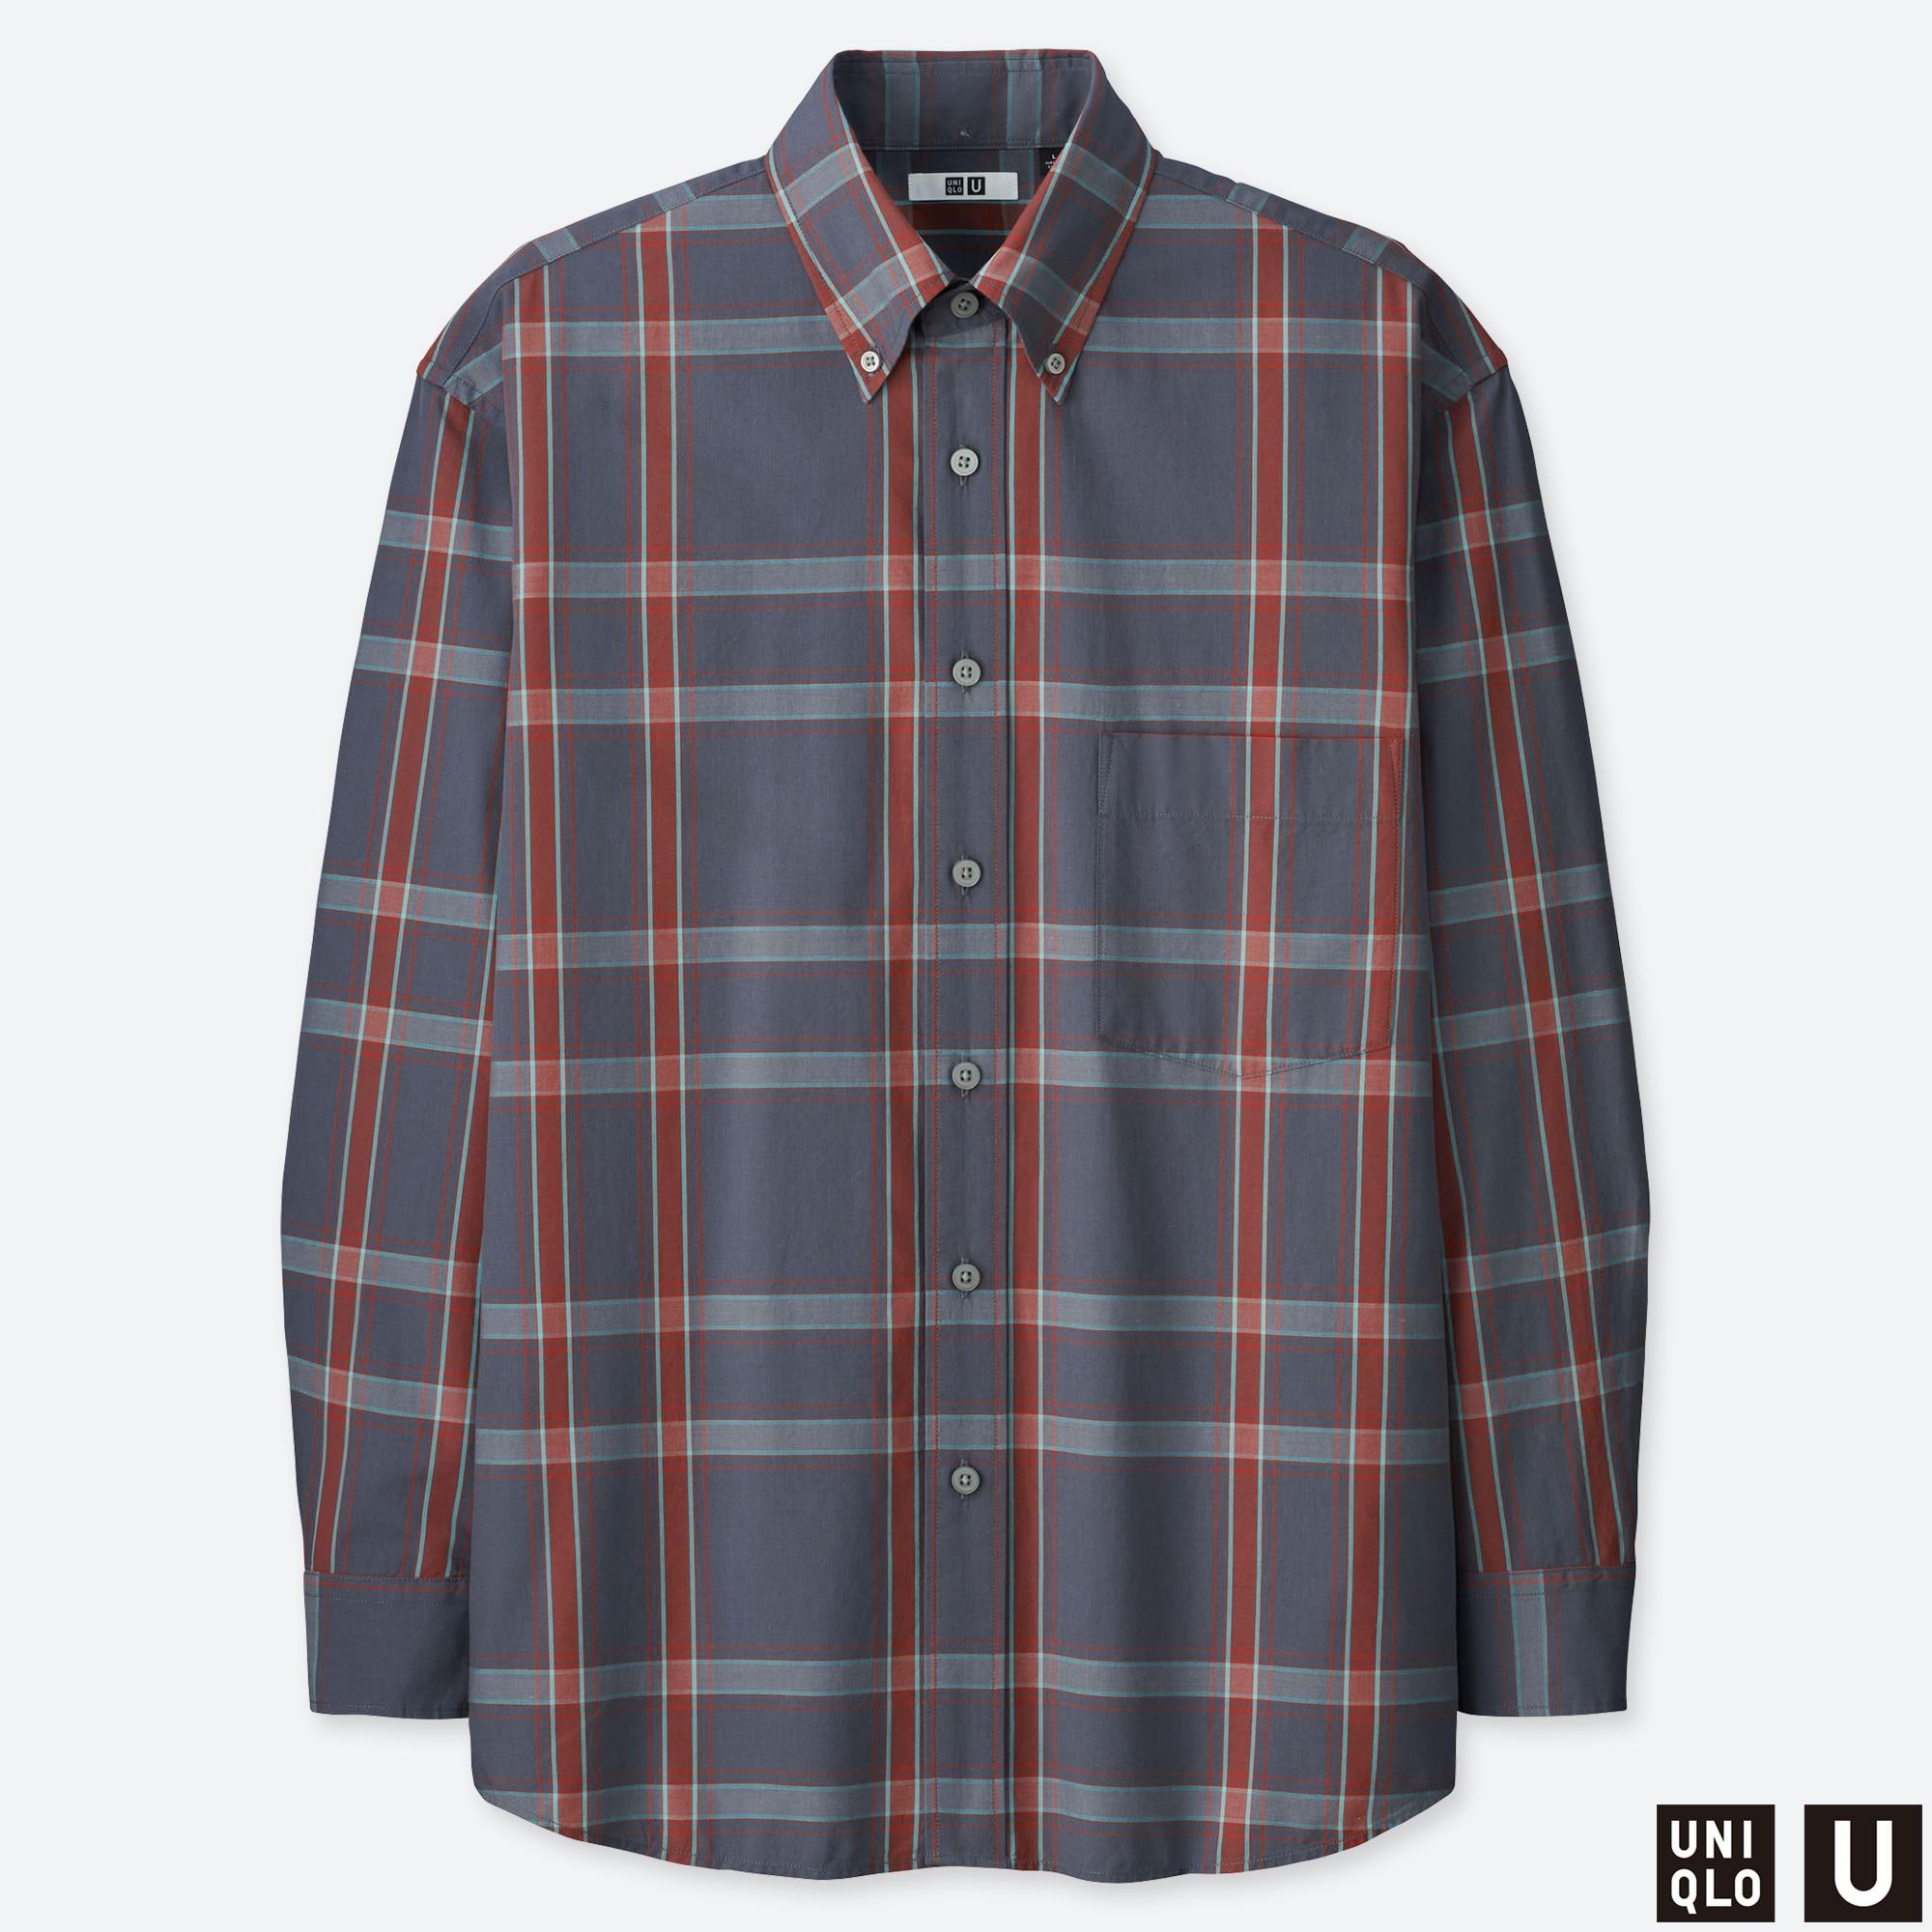 ARTFFEL Mens Long Sleeve Relaxed Fit Checkered Button Up Cotton Dress Work Shirt